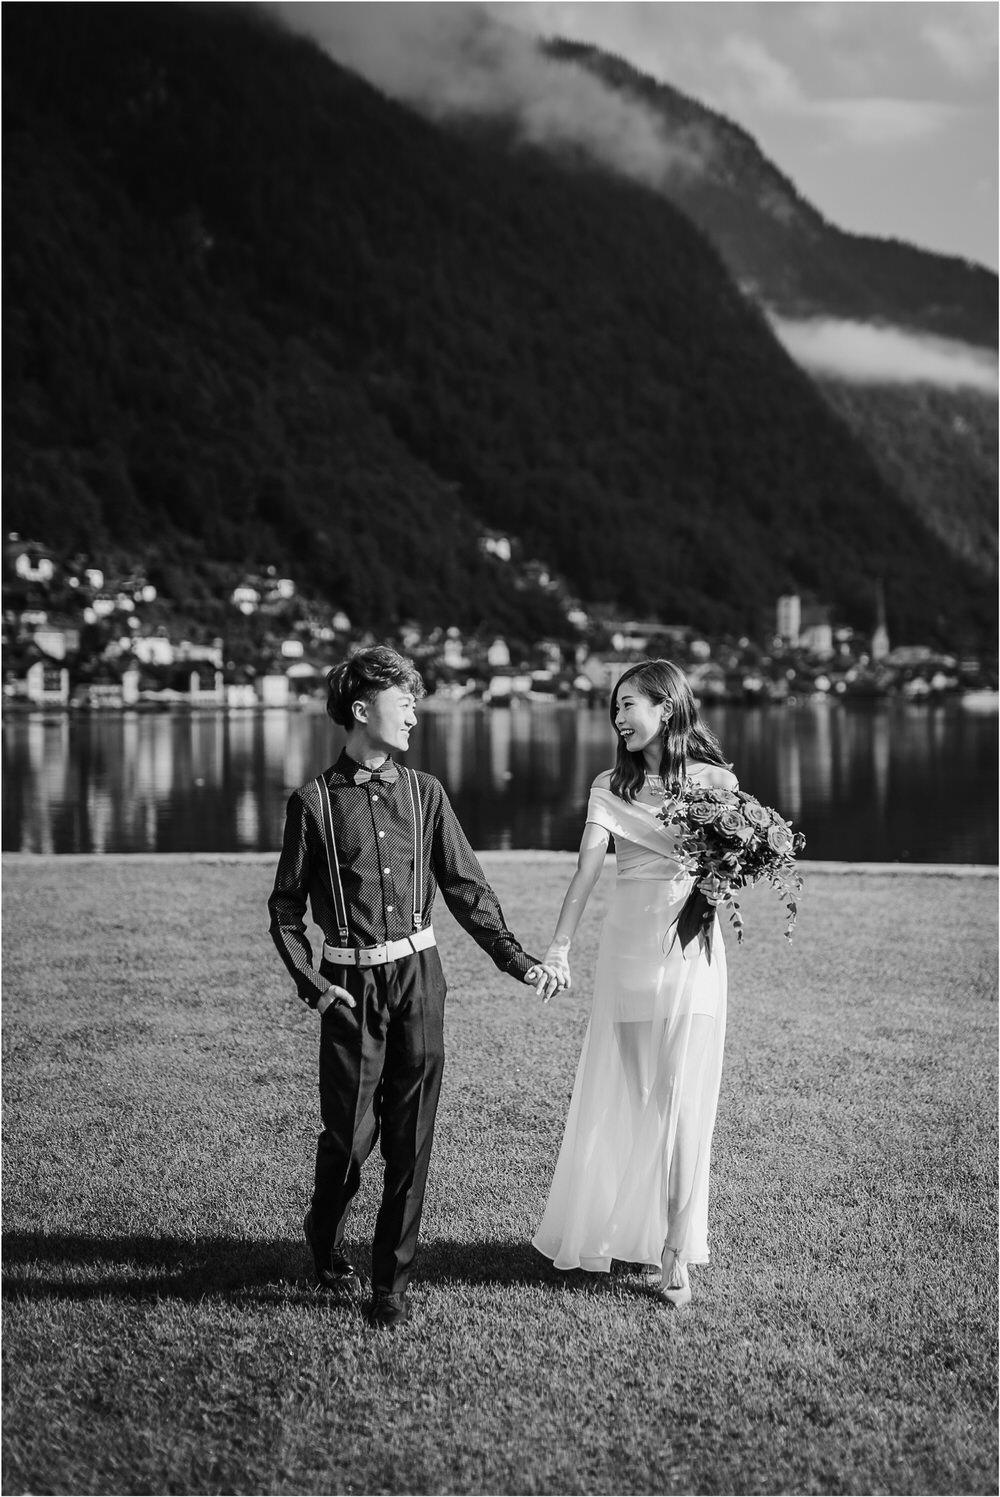 hallstatt austria wedding engagement photographer asian proposal surprise photography recommended nature professional 0055.jpg